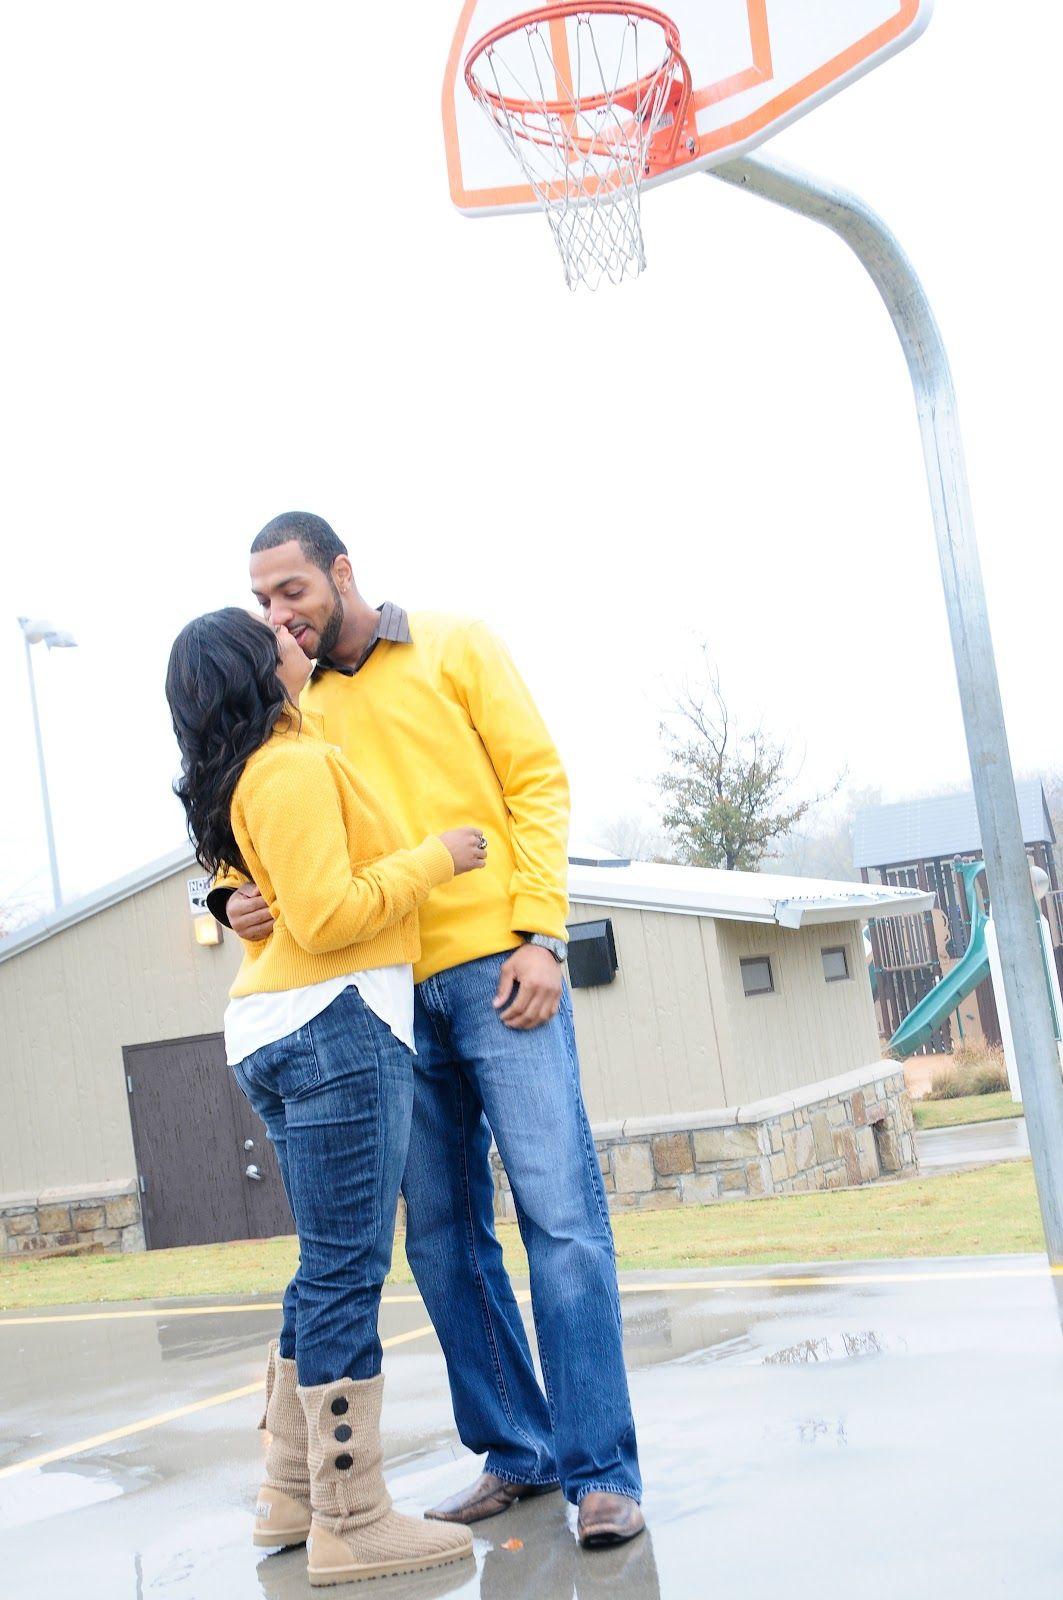 Basketball court engagement photo | Engagement photos | Pinterest ...